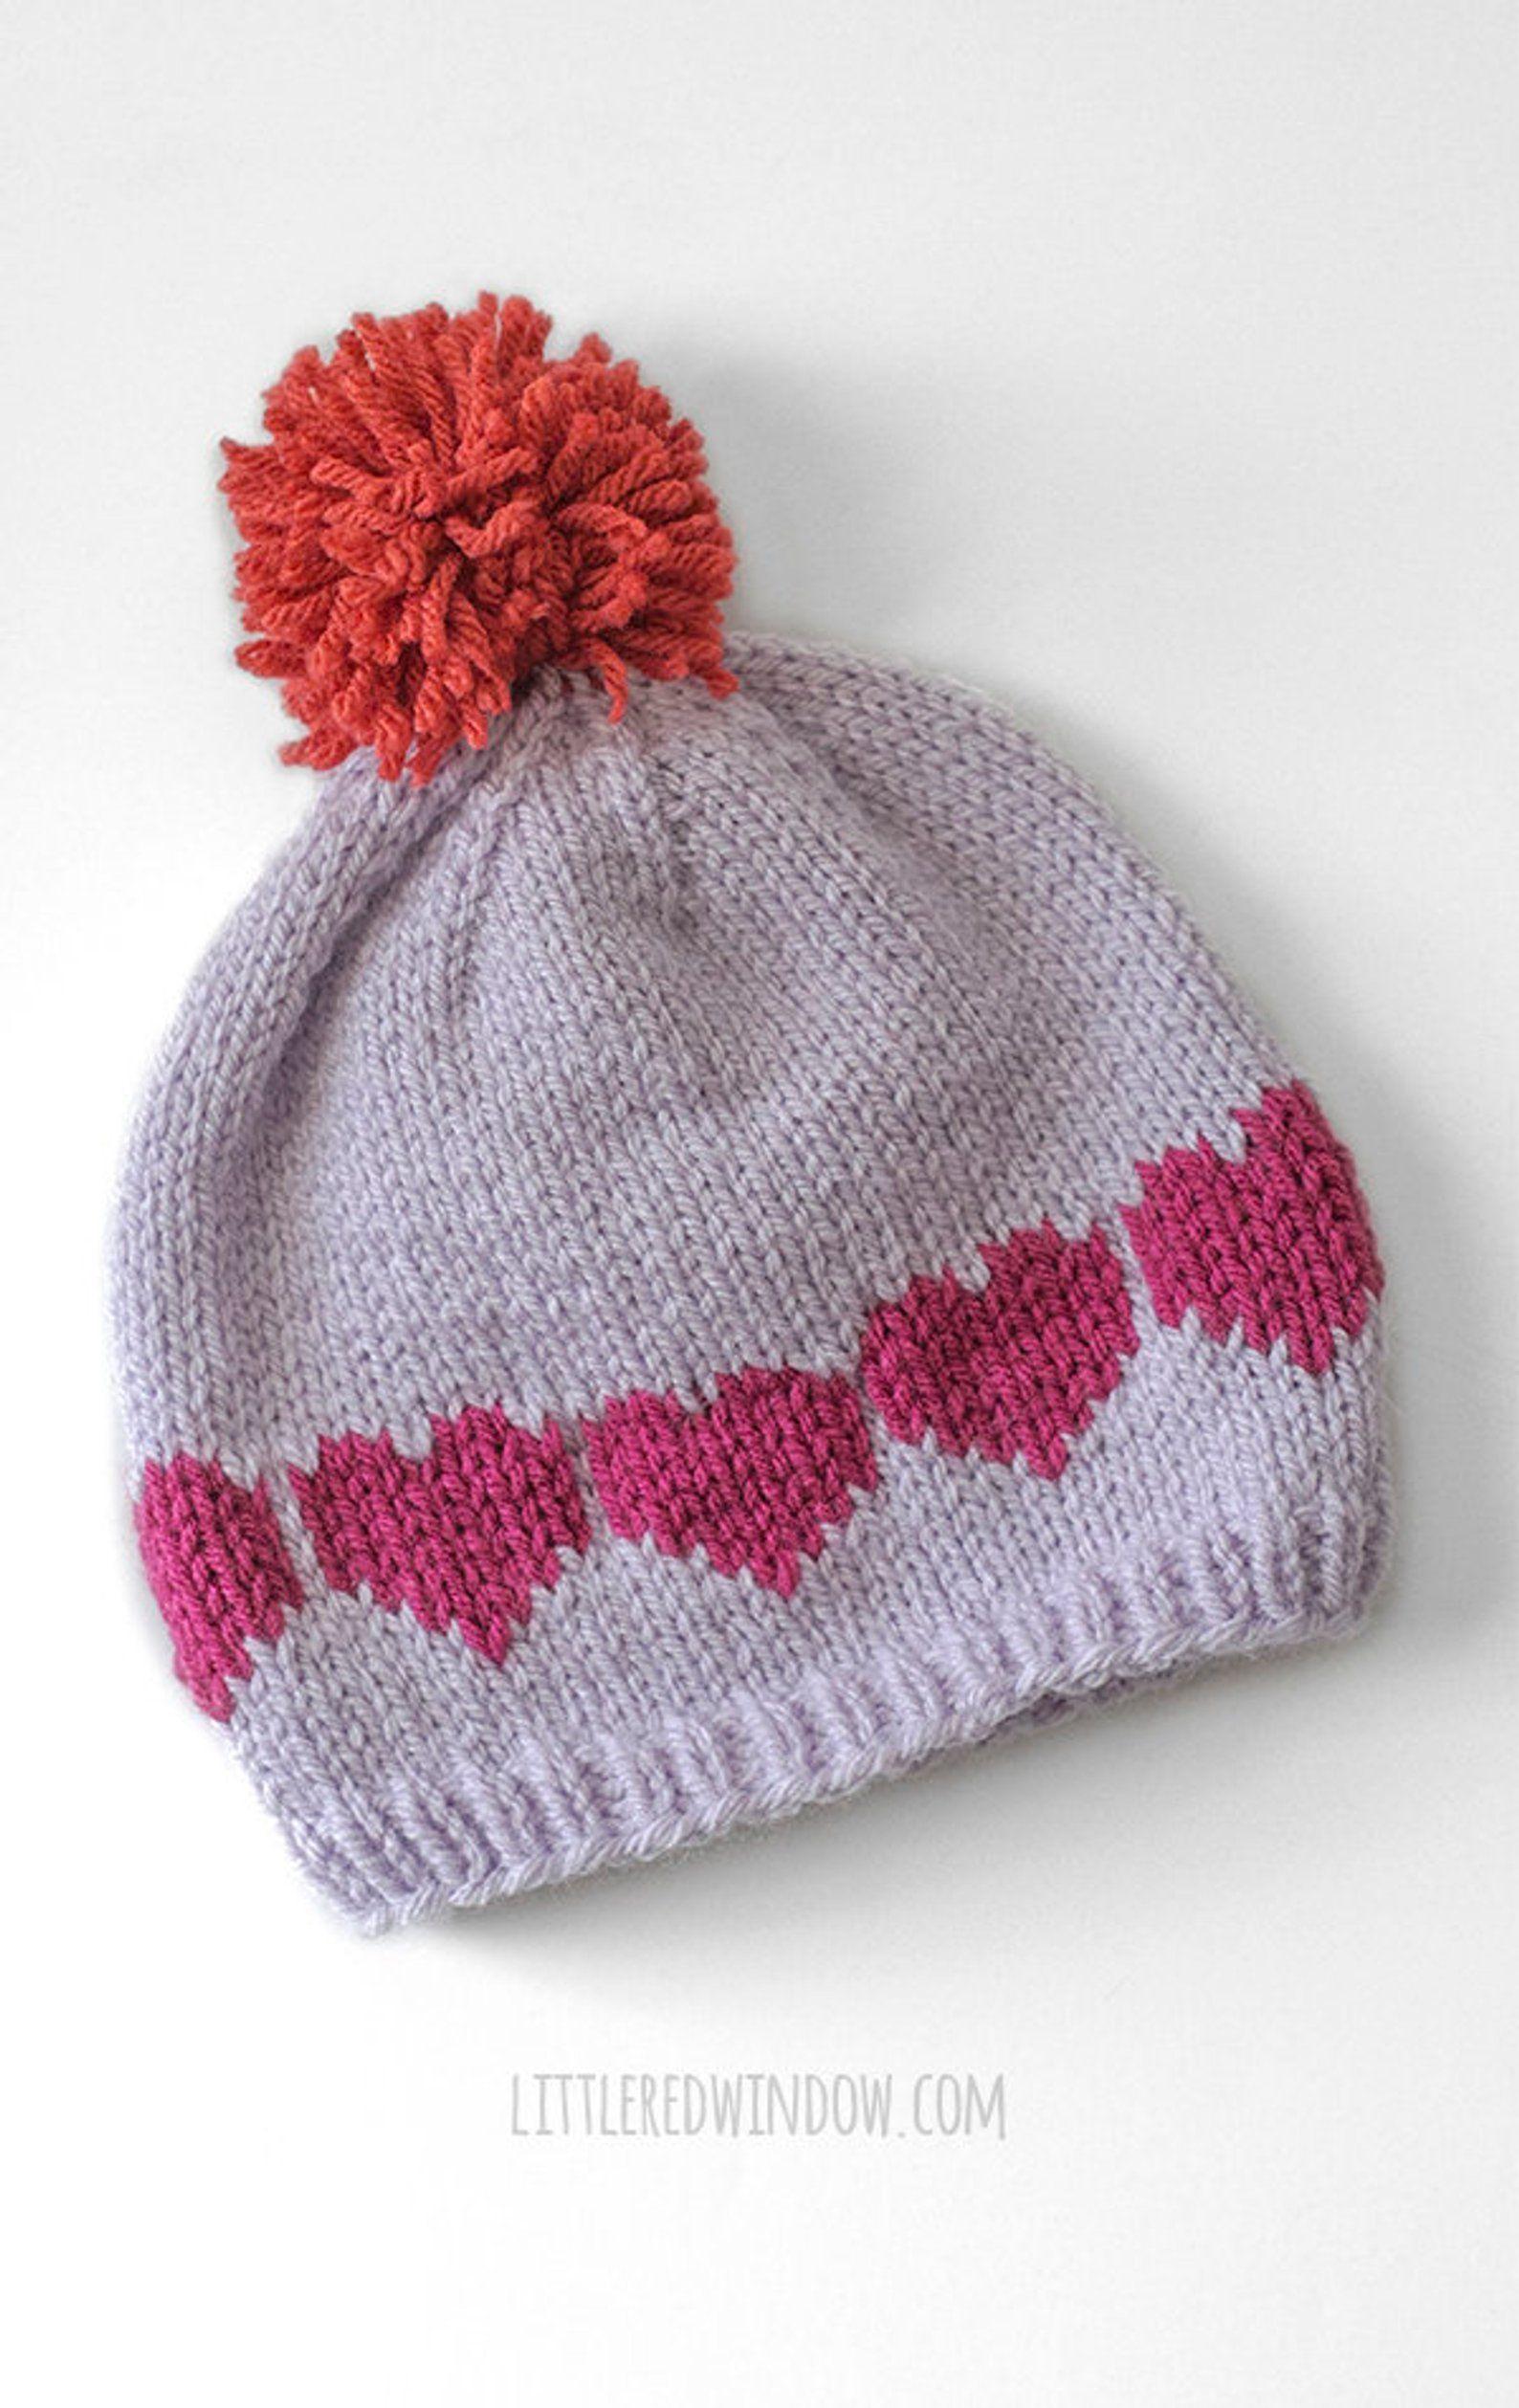 Valentine Love Notes Hats Knitting Pattern Valentine Pattern Etsy In 2021 Knitting Hat Knitting Patterns Knitting Patterns